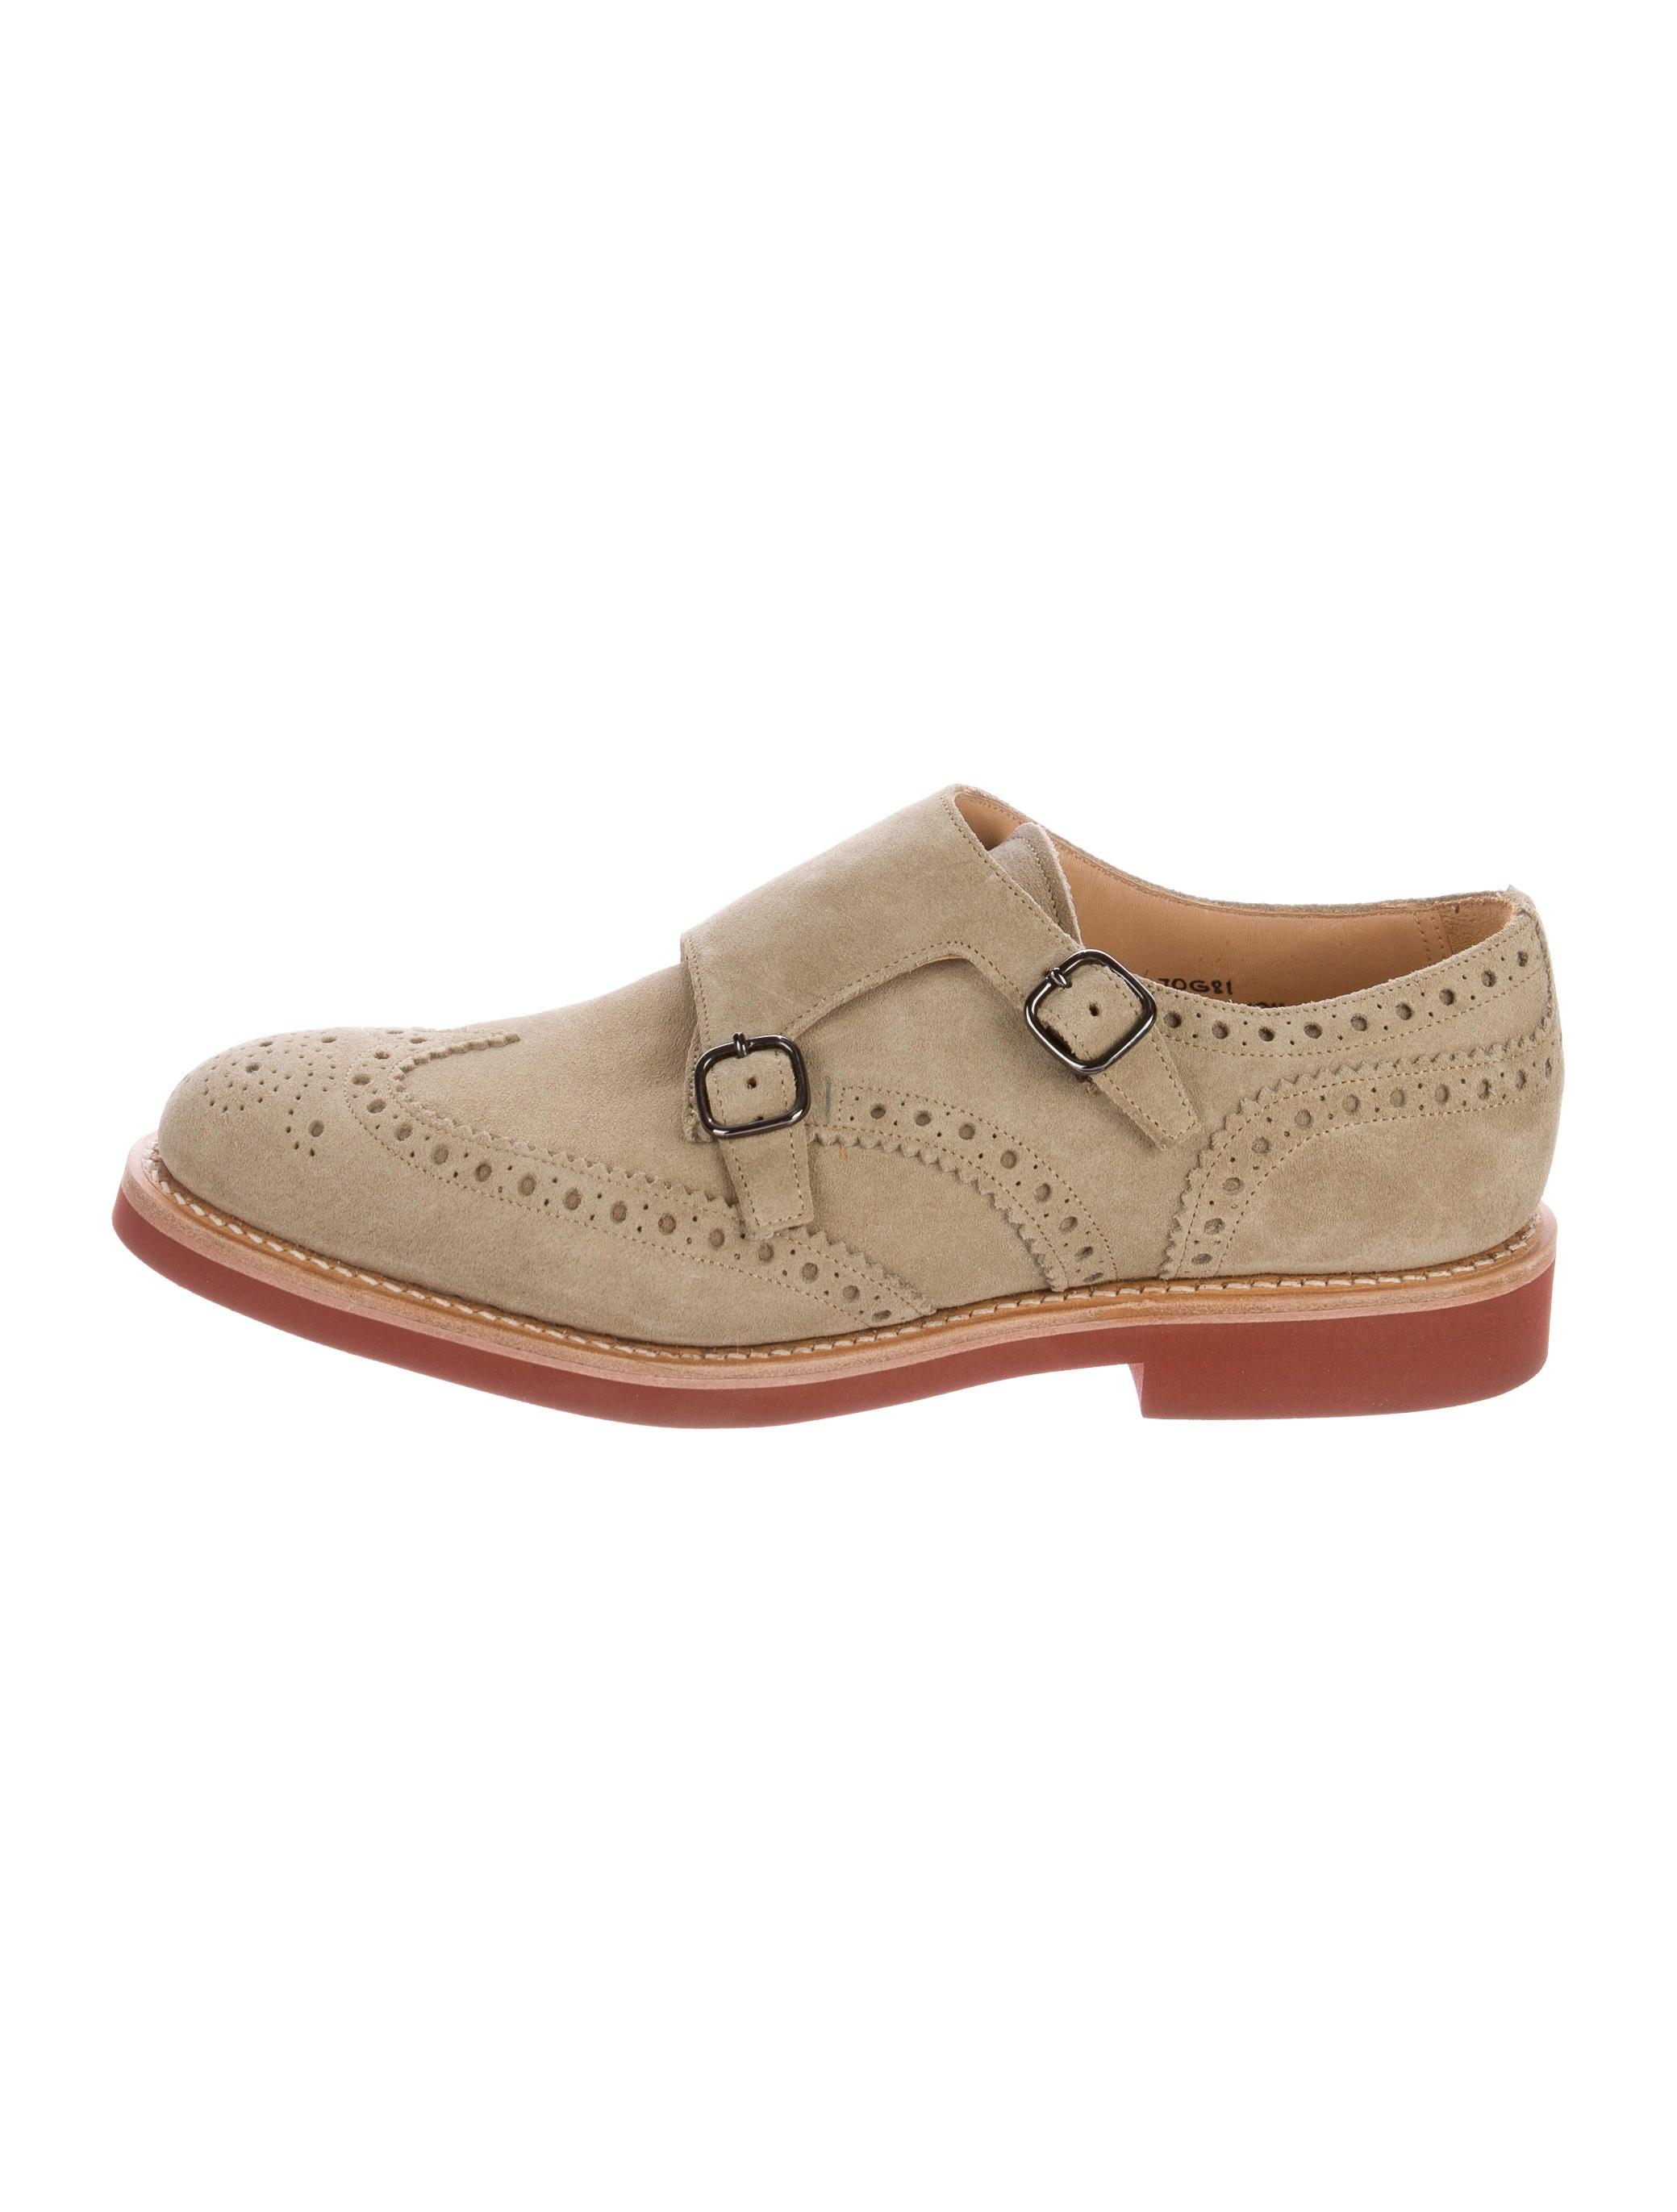 Church s Kelby Double Monk Strap Shoes - Shoes - CHU20484  545866b2ff2